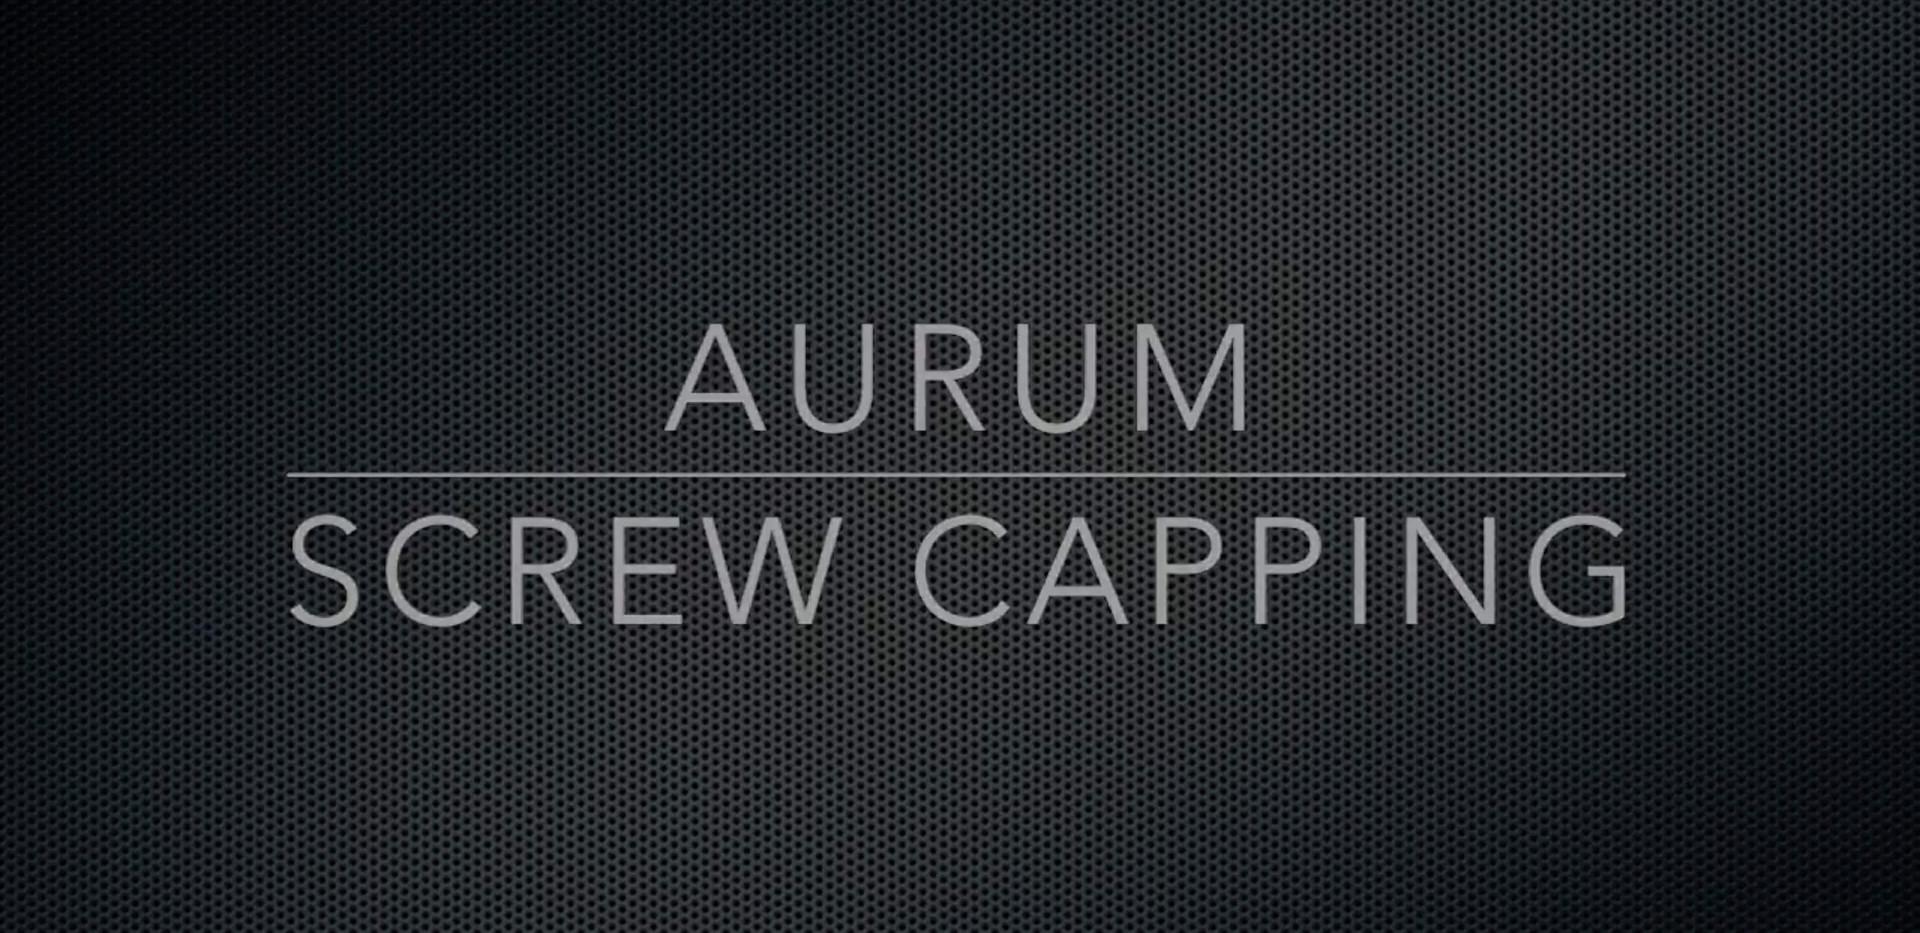 Screw-on capper video